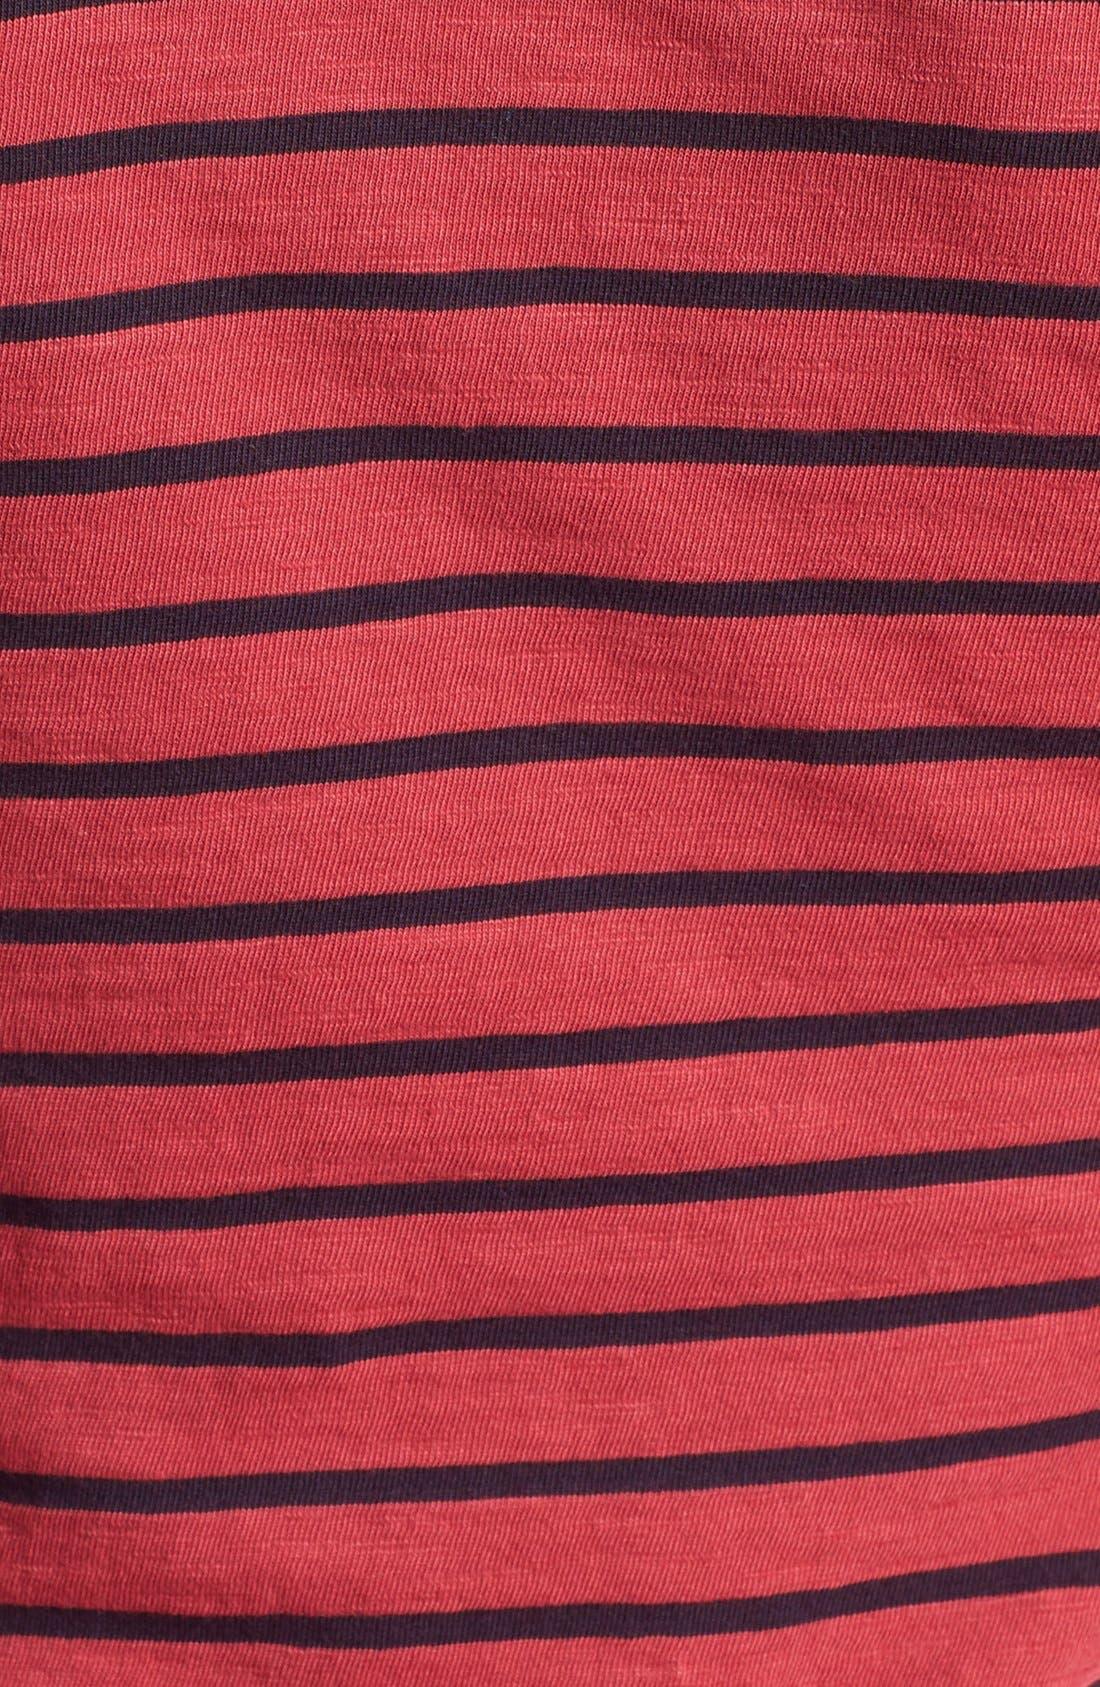 Alternate Image 3  - Free People 'Hard Candy' Embellished Sleeve Tee